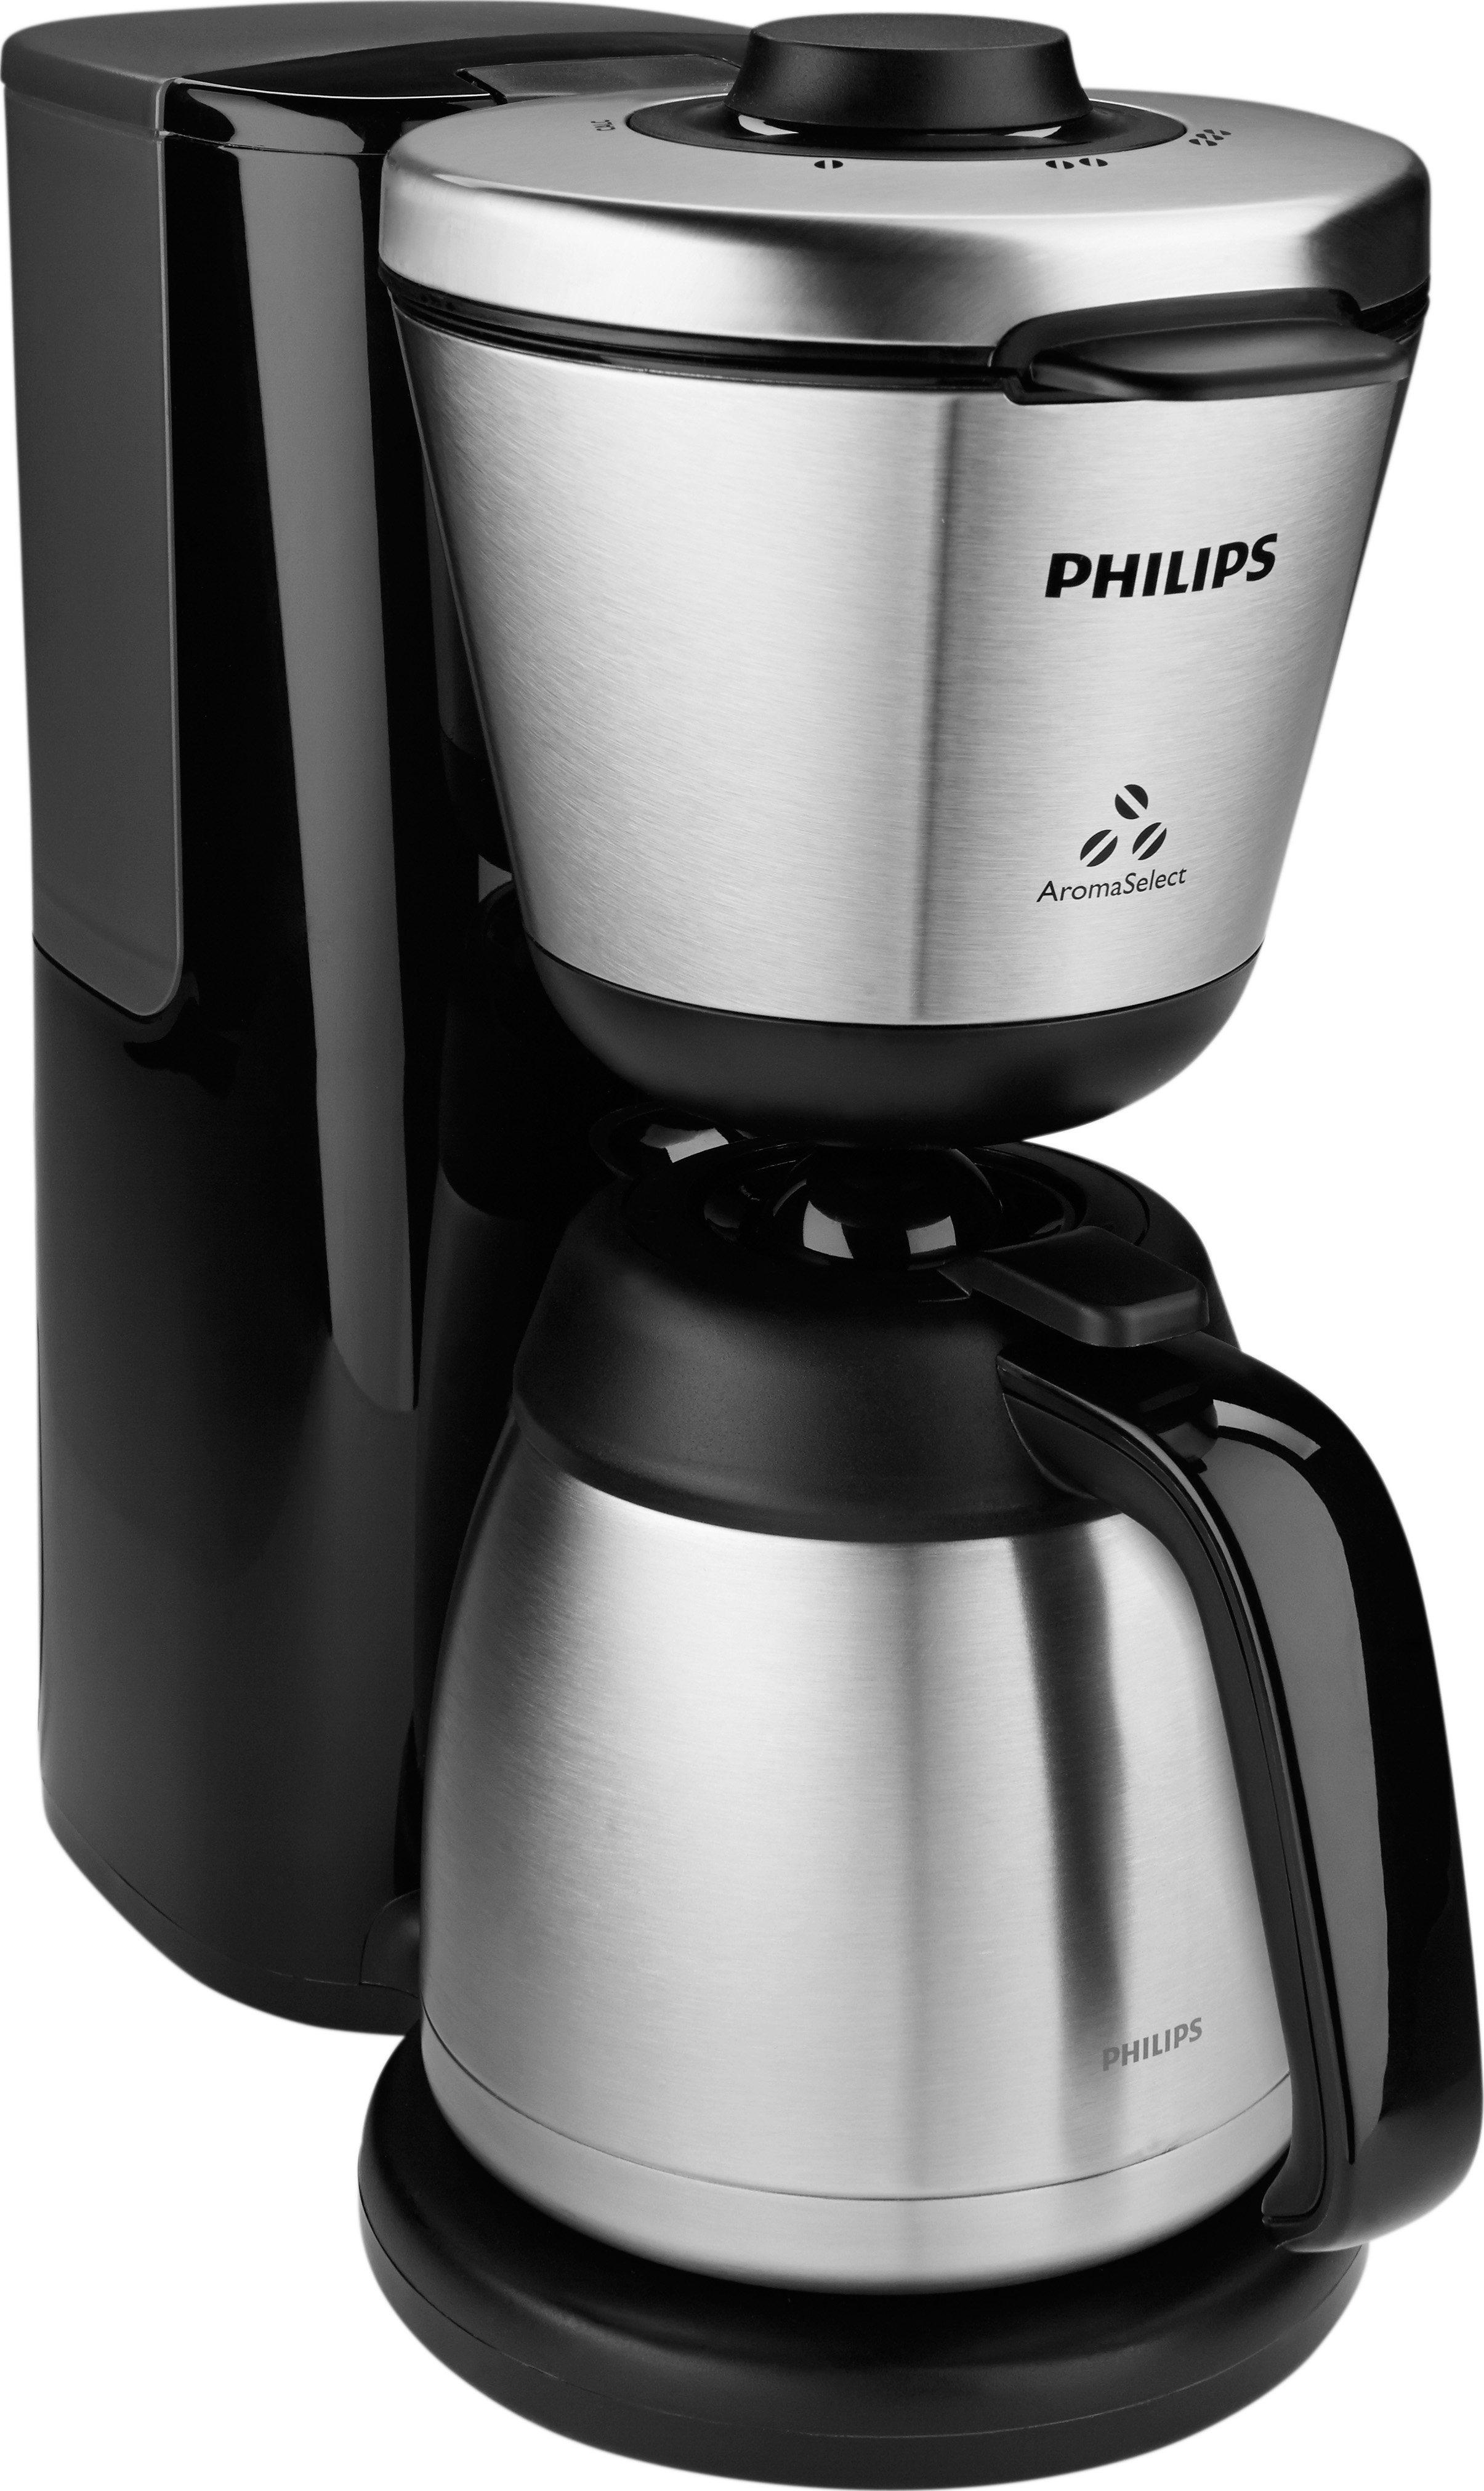 Filterkaffeemaschine HD7697/90 Intense AromaSelect, 1,2l Kaffeekanne, Papierfilter, mit Thermokanne